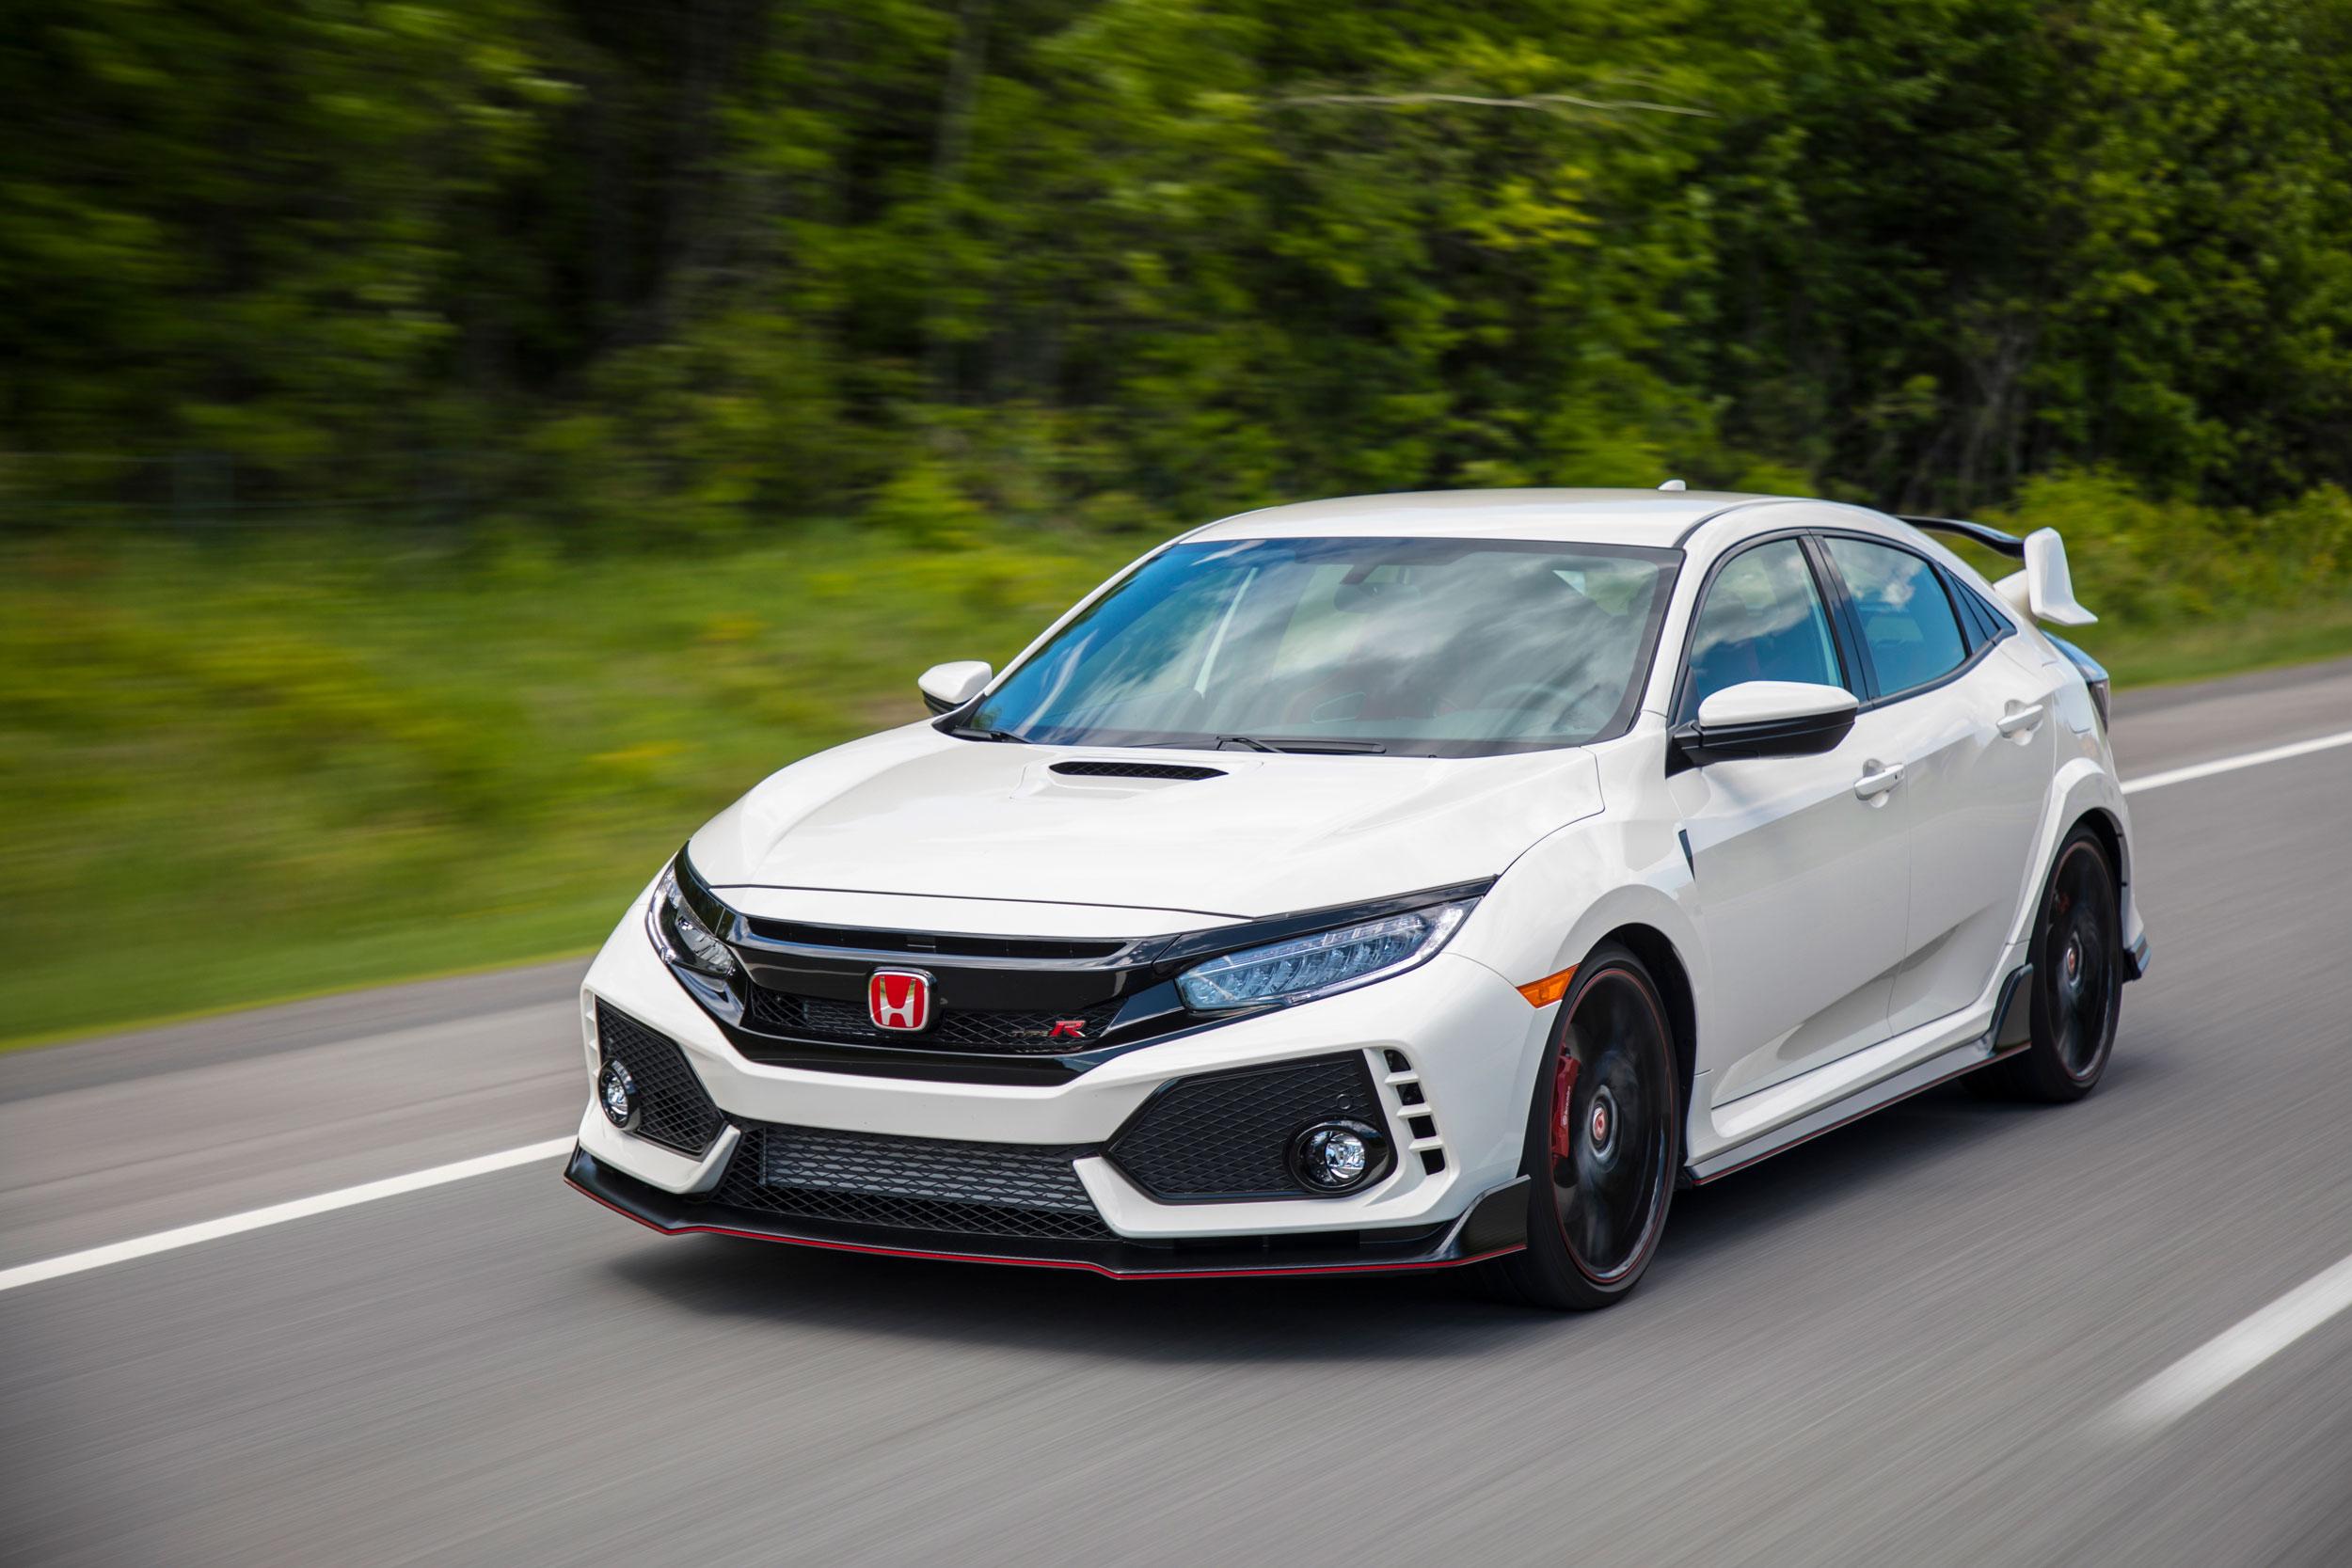 2019 Honda Civic Type-R front 3/4